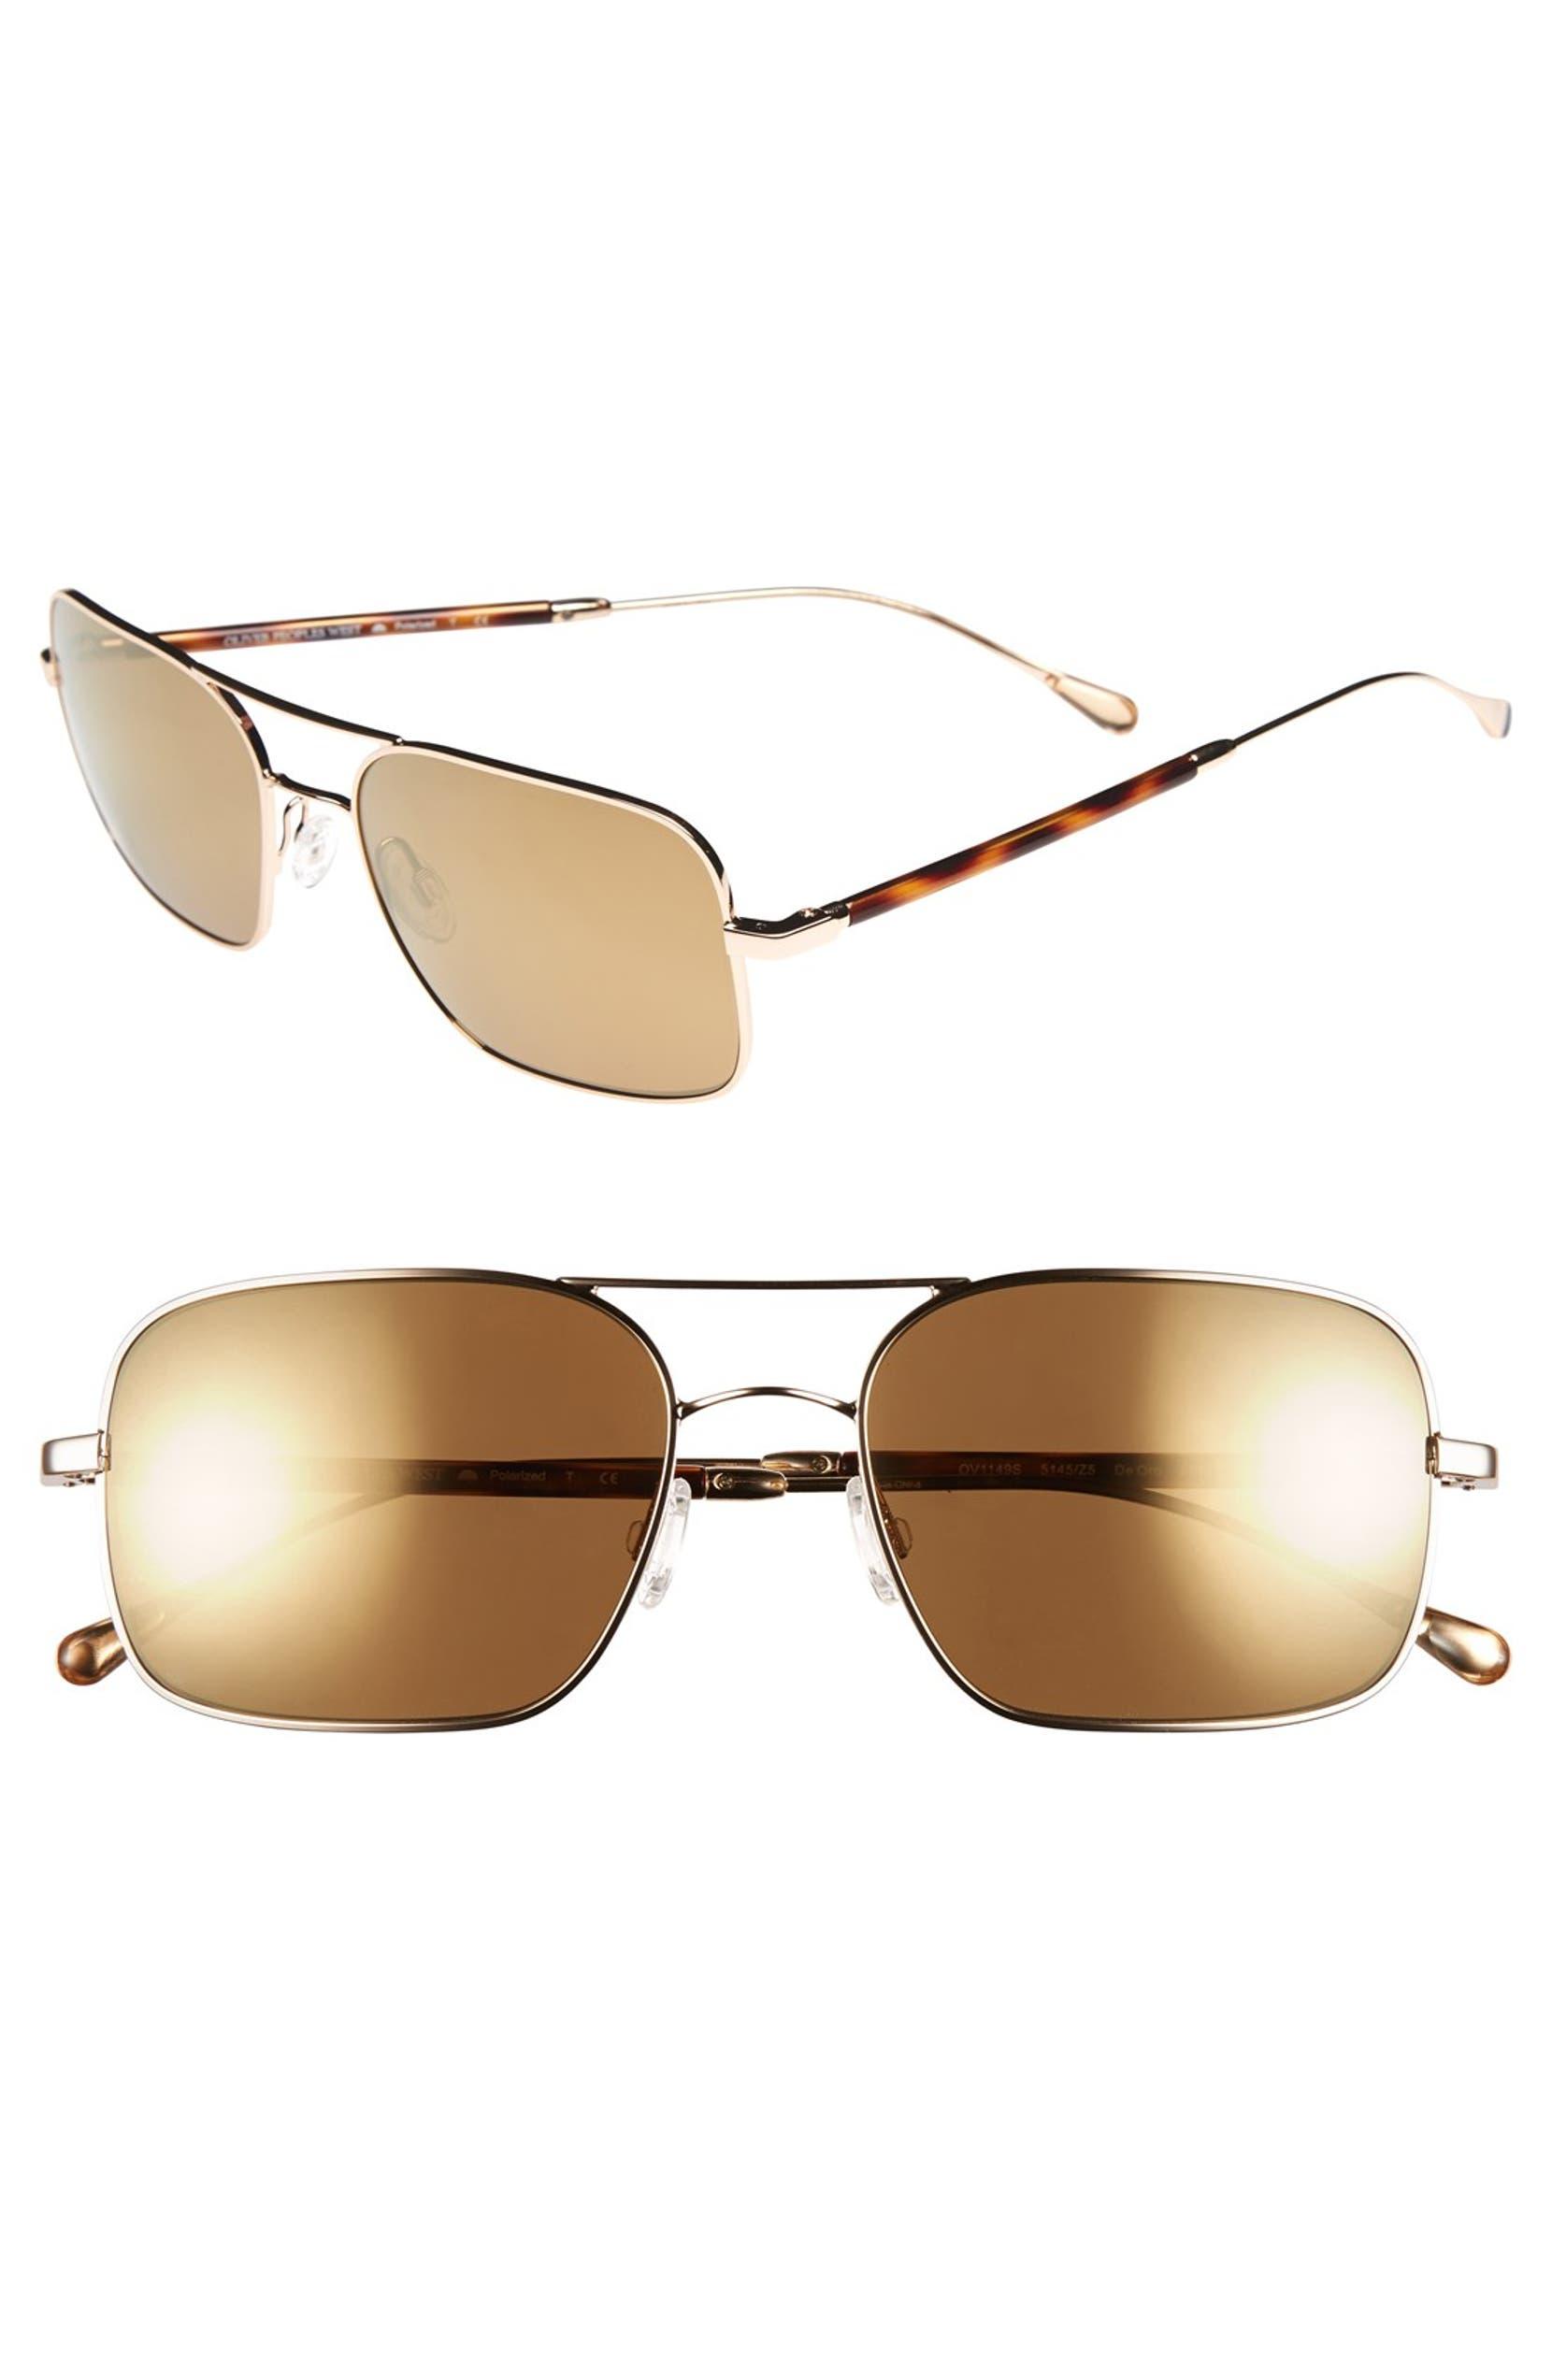 8235a5c2a8 Oliver Peoples West Sunglasses  De Oro  56mm Polarized Metal Aviator  Sunglasses